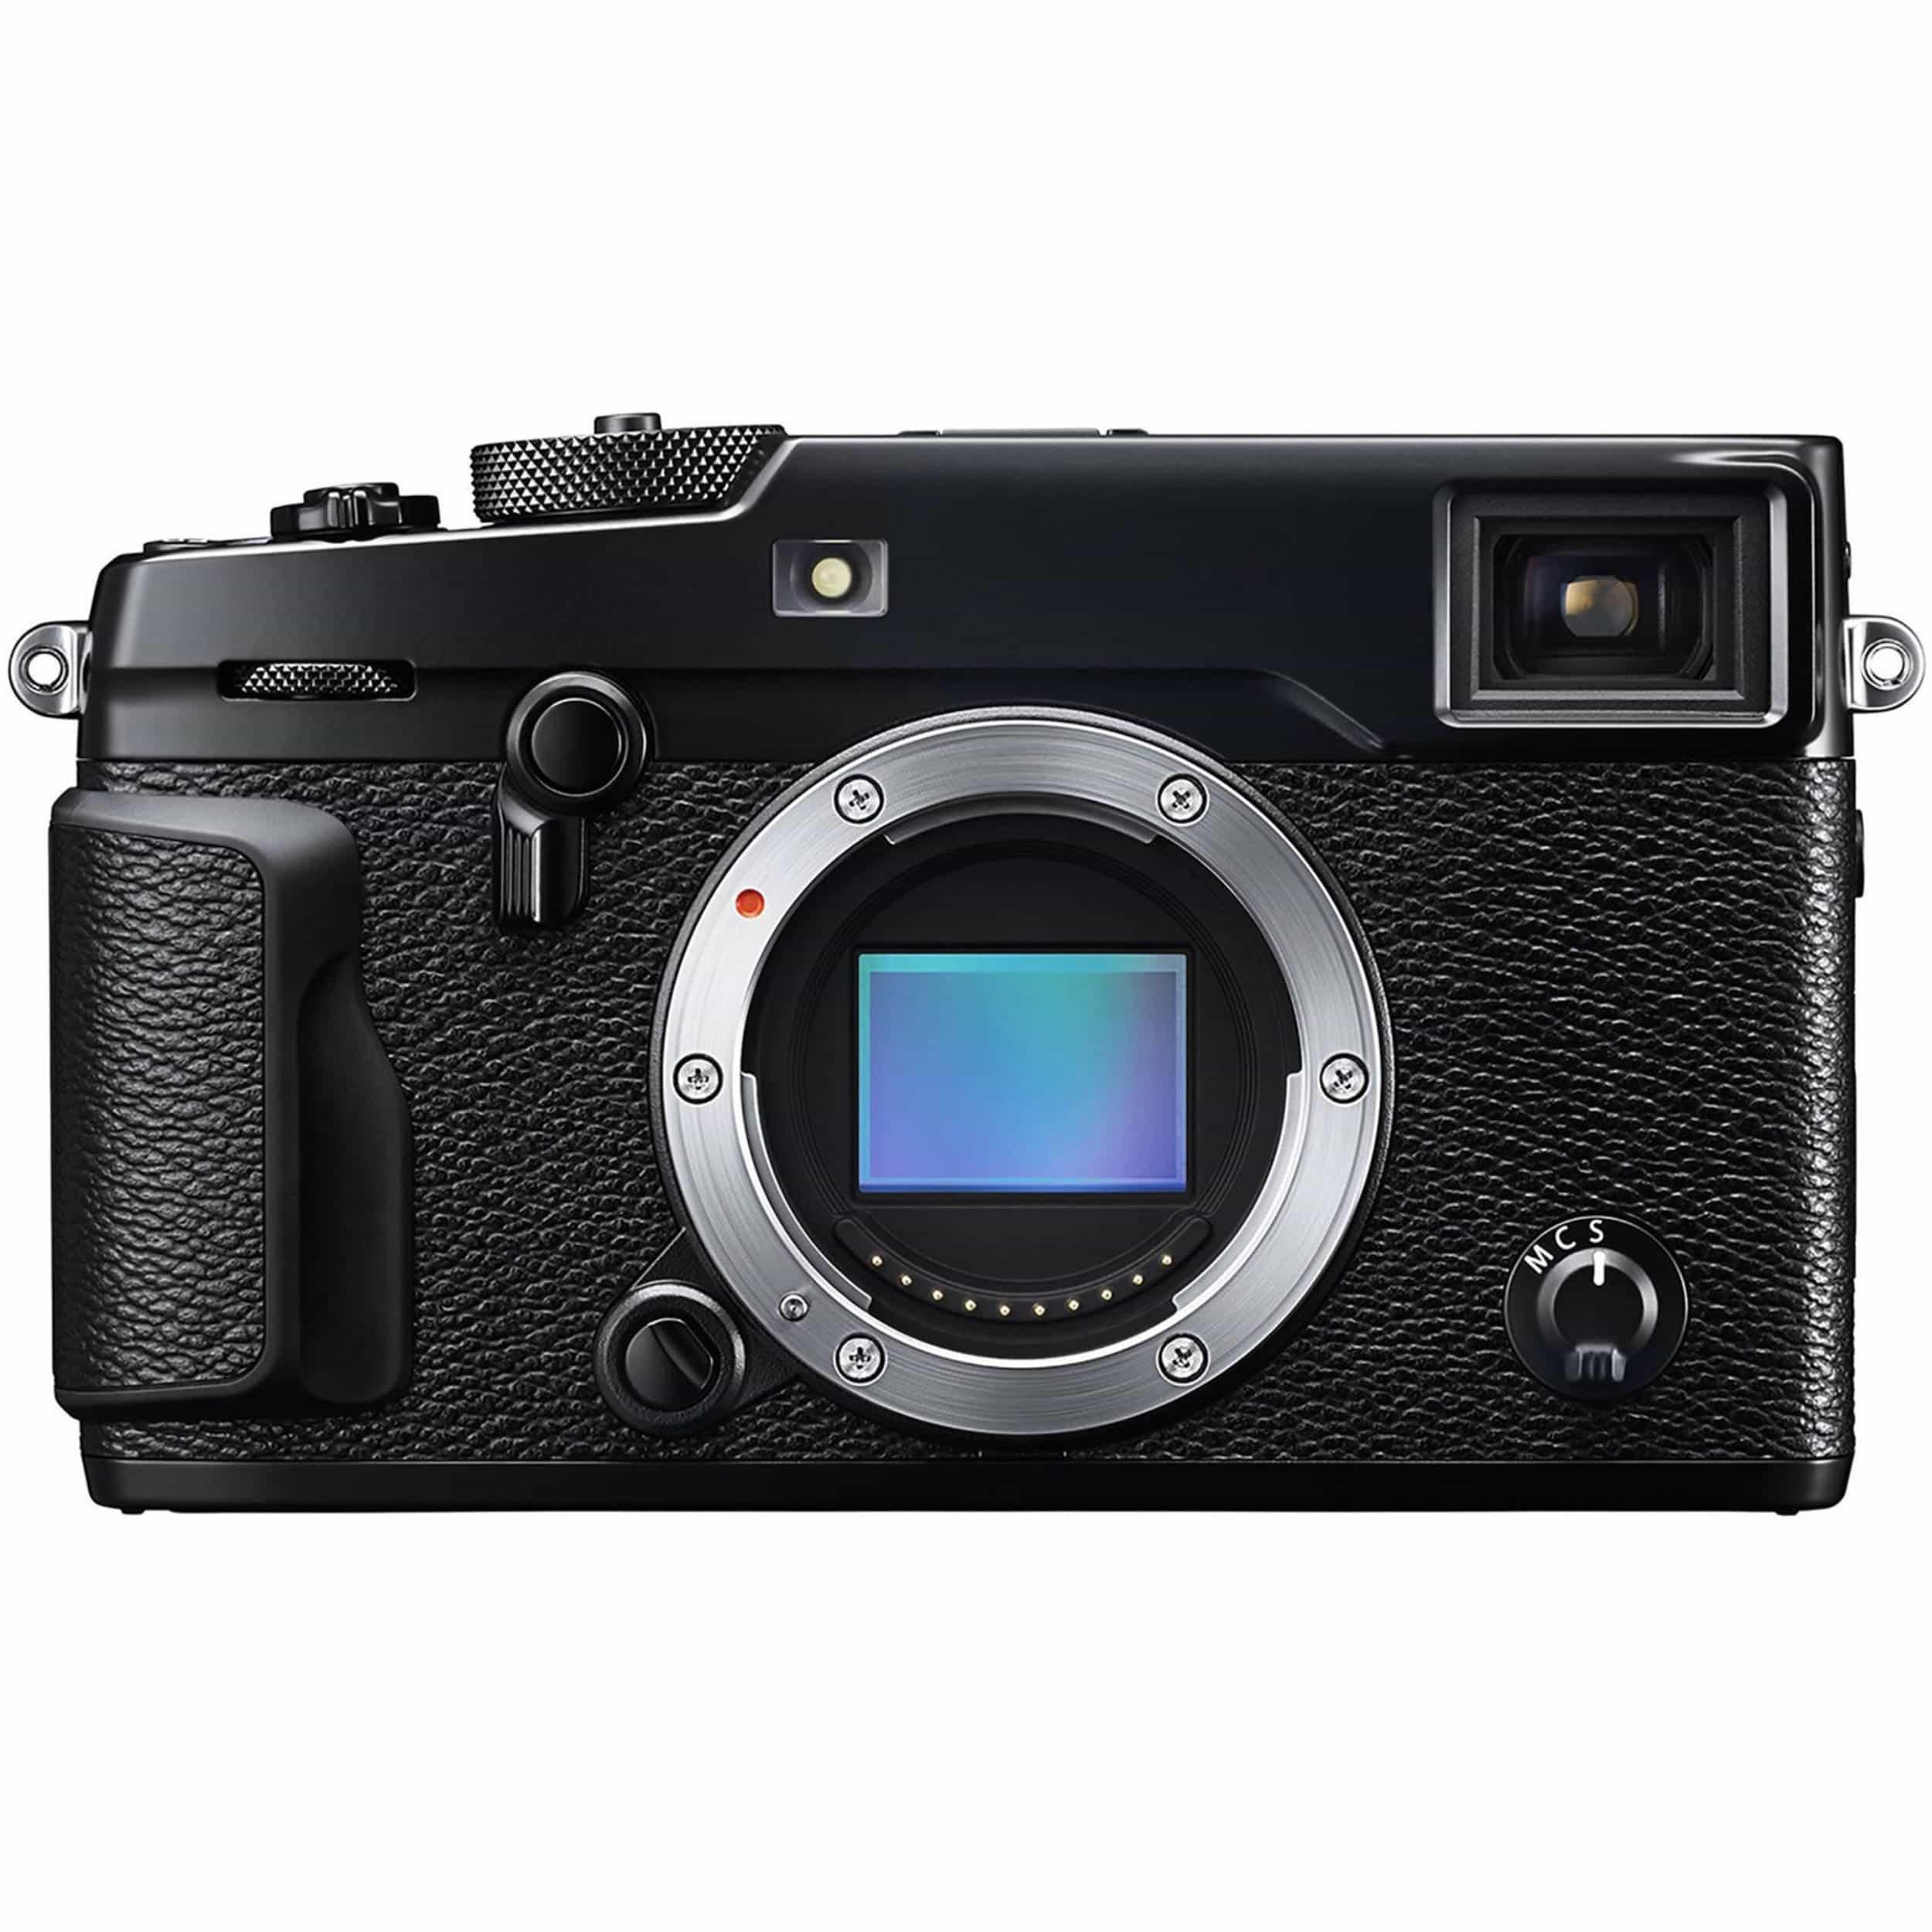 Fujifilm X-Pro 2 digital mirrorless rangefinder camera